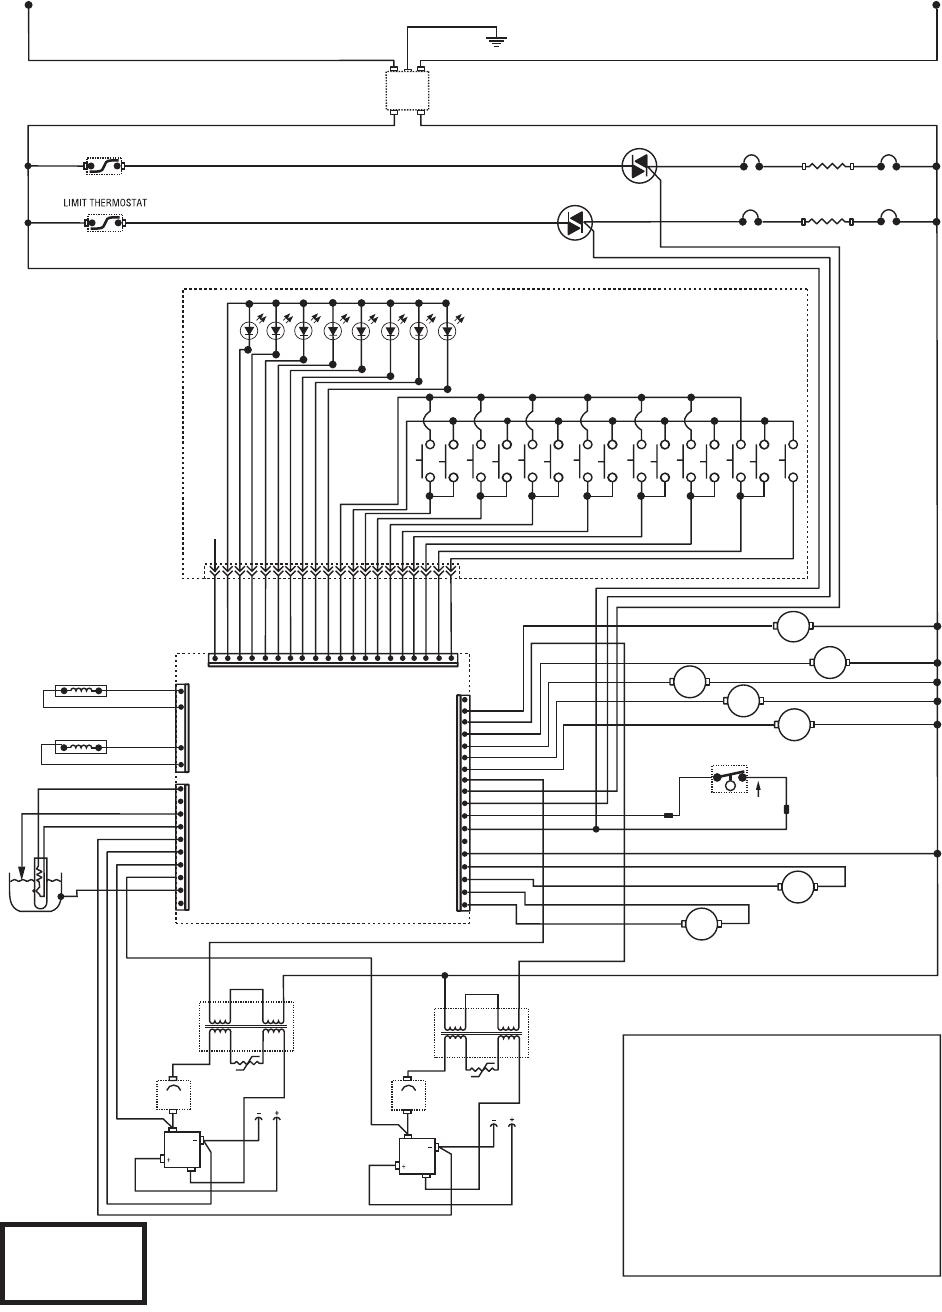 bunn s/n dual068000 schematic wiring diagram dual sh dbc (w/smart funnel)  manuals